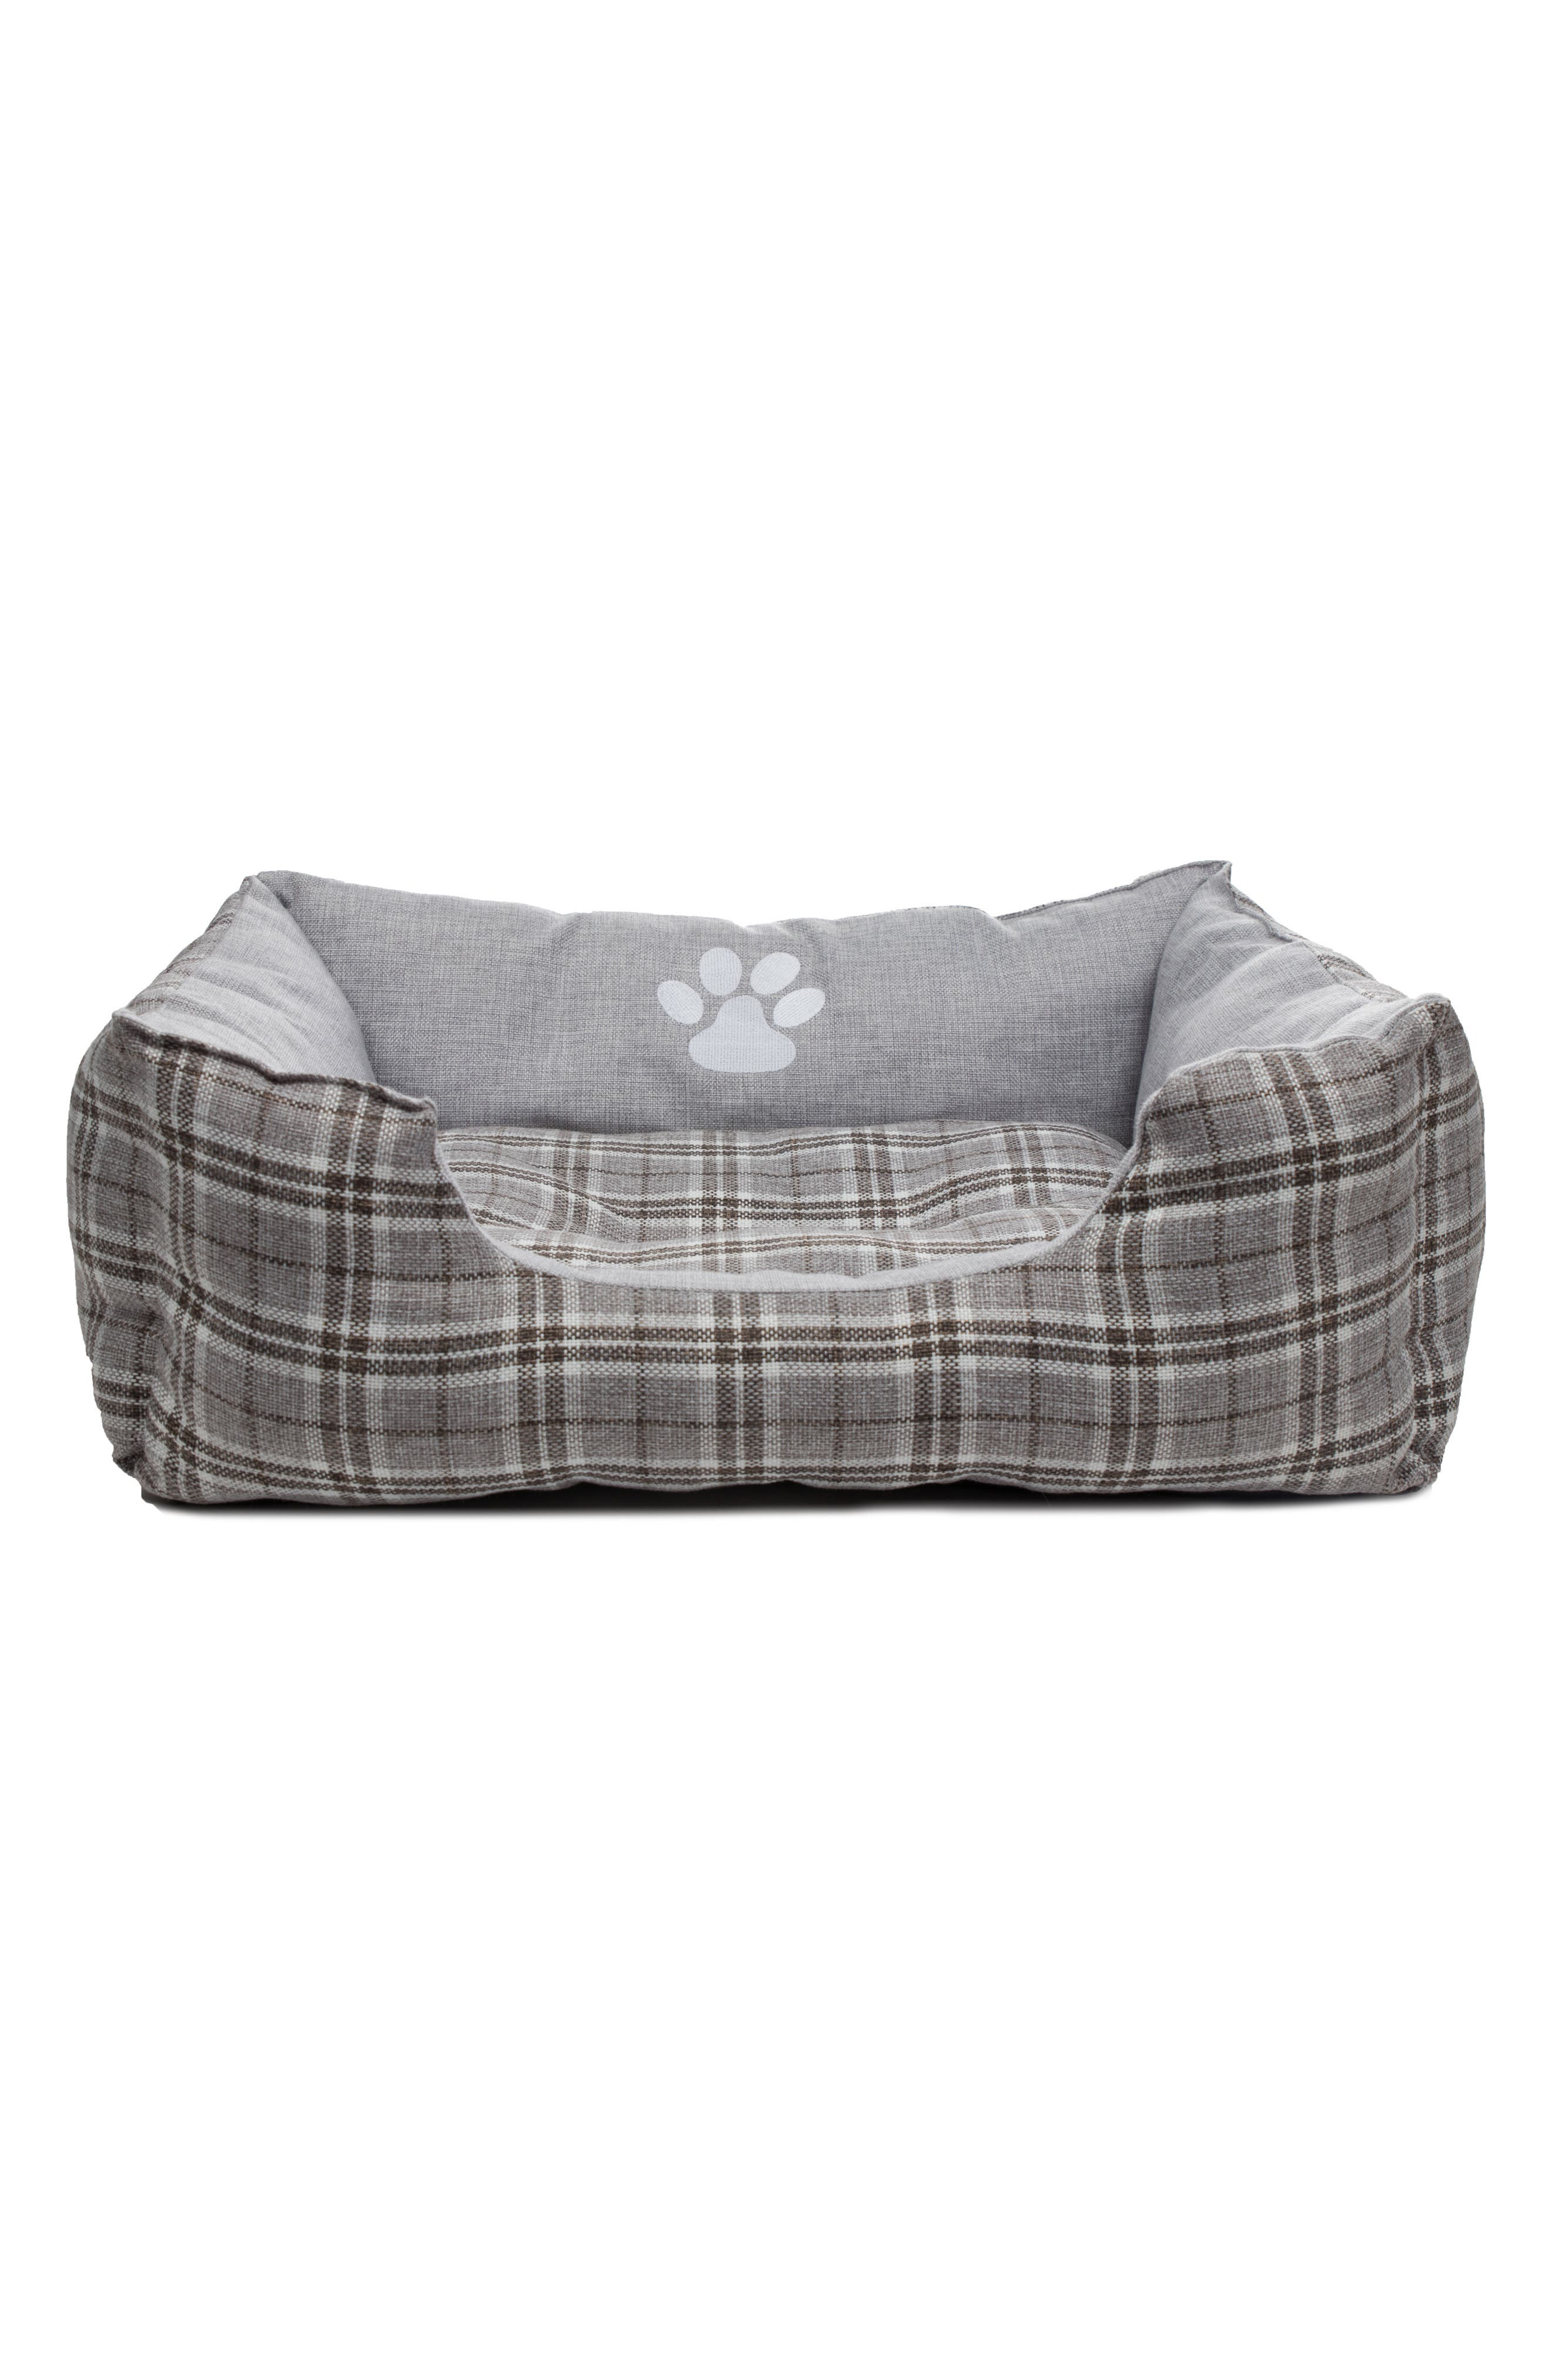 Harlee Large Square Pet Bed,                         Main,                         color, Grey